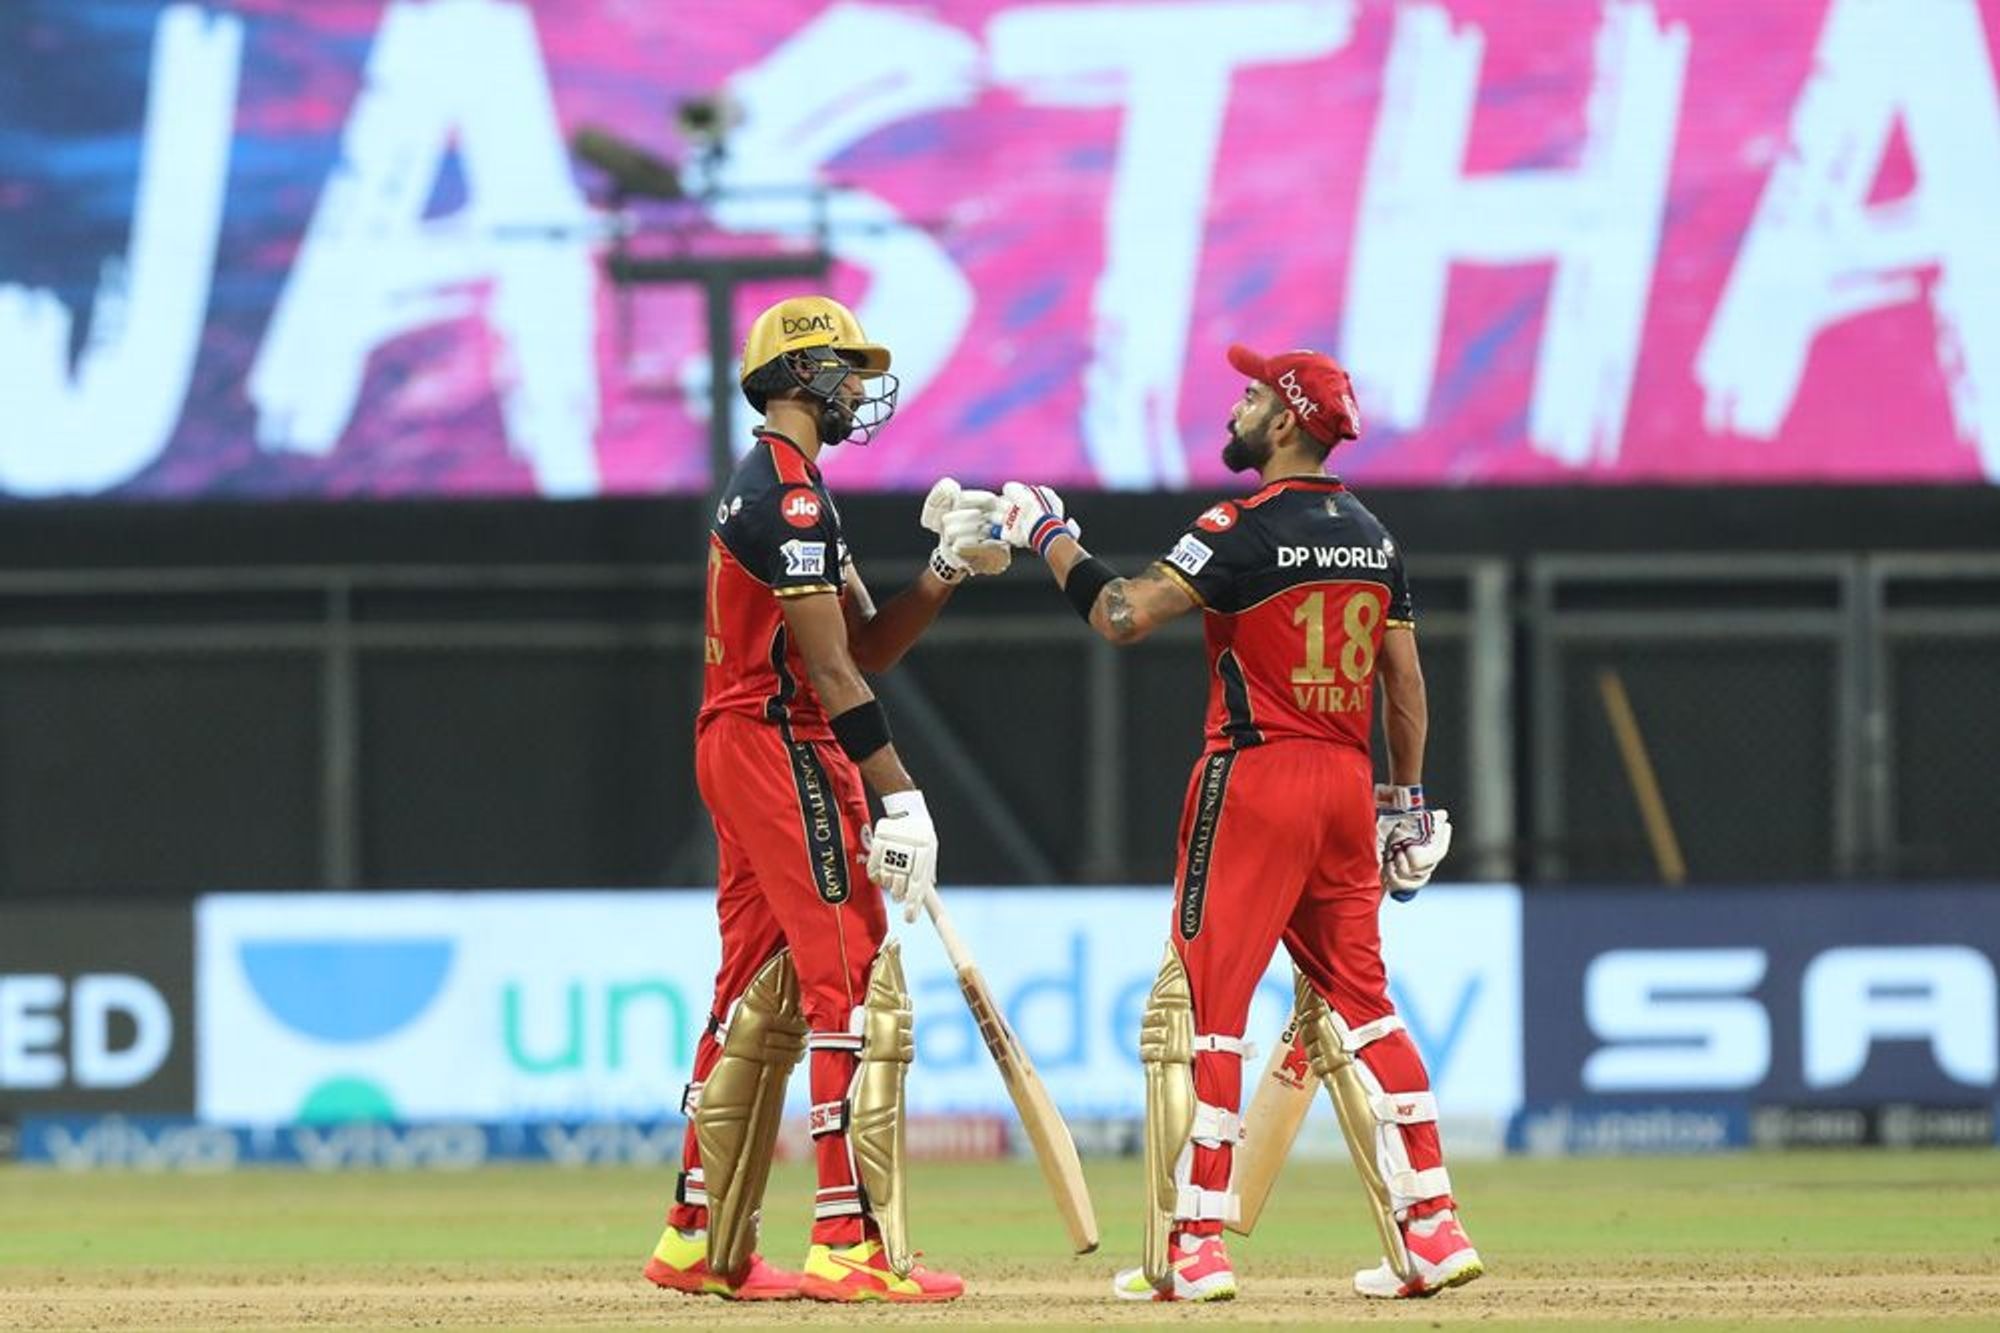 Devdutt Padikkal and Virat Kohli for RCB (Photo- BCCI/IPL)